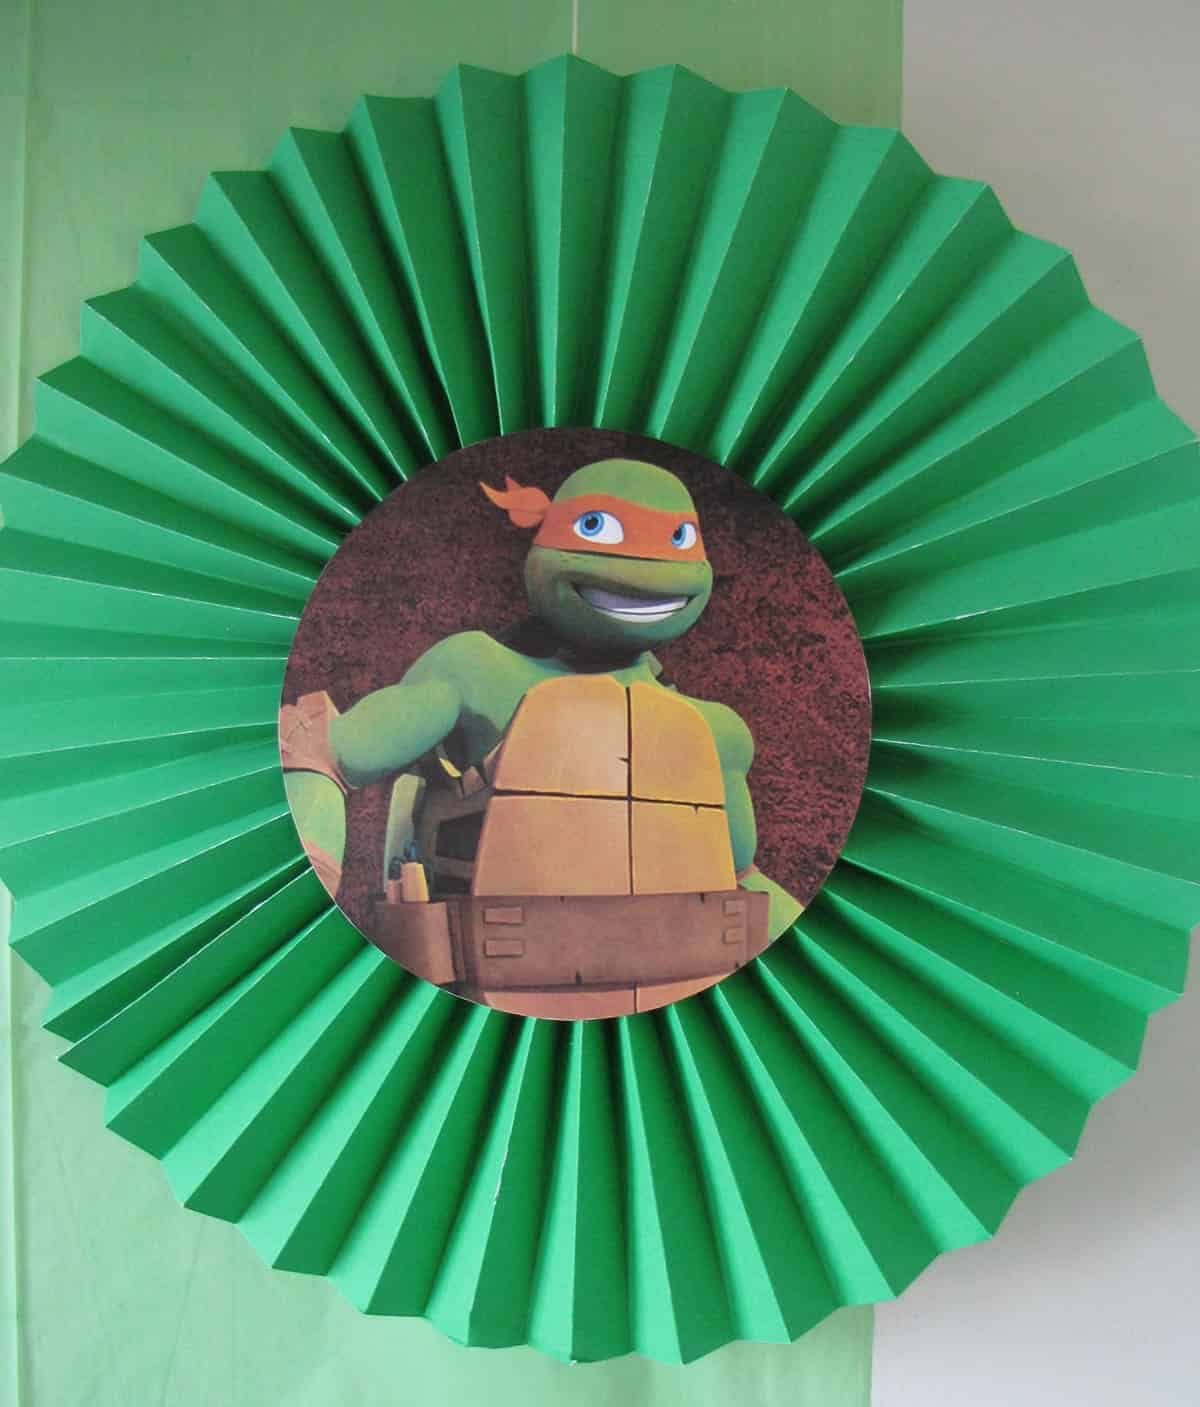 Ninja Turtles green party fan with Michelangelo in front of green backdrop